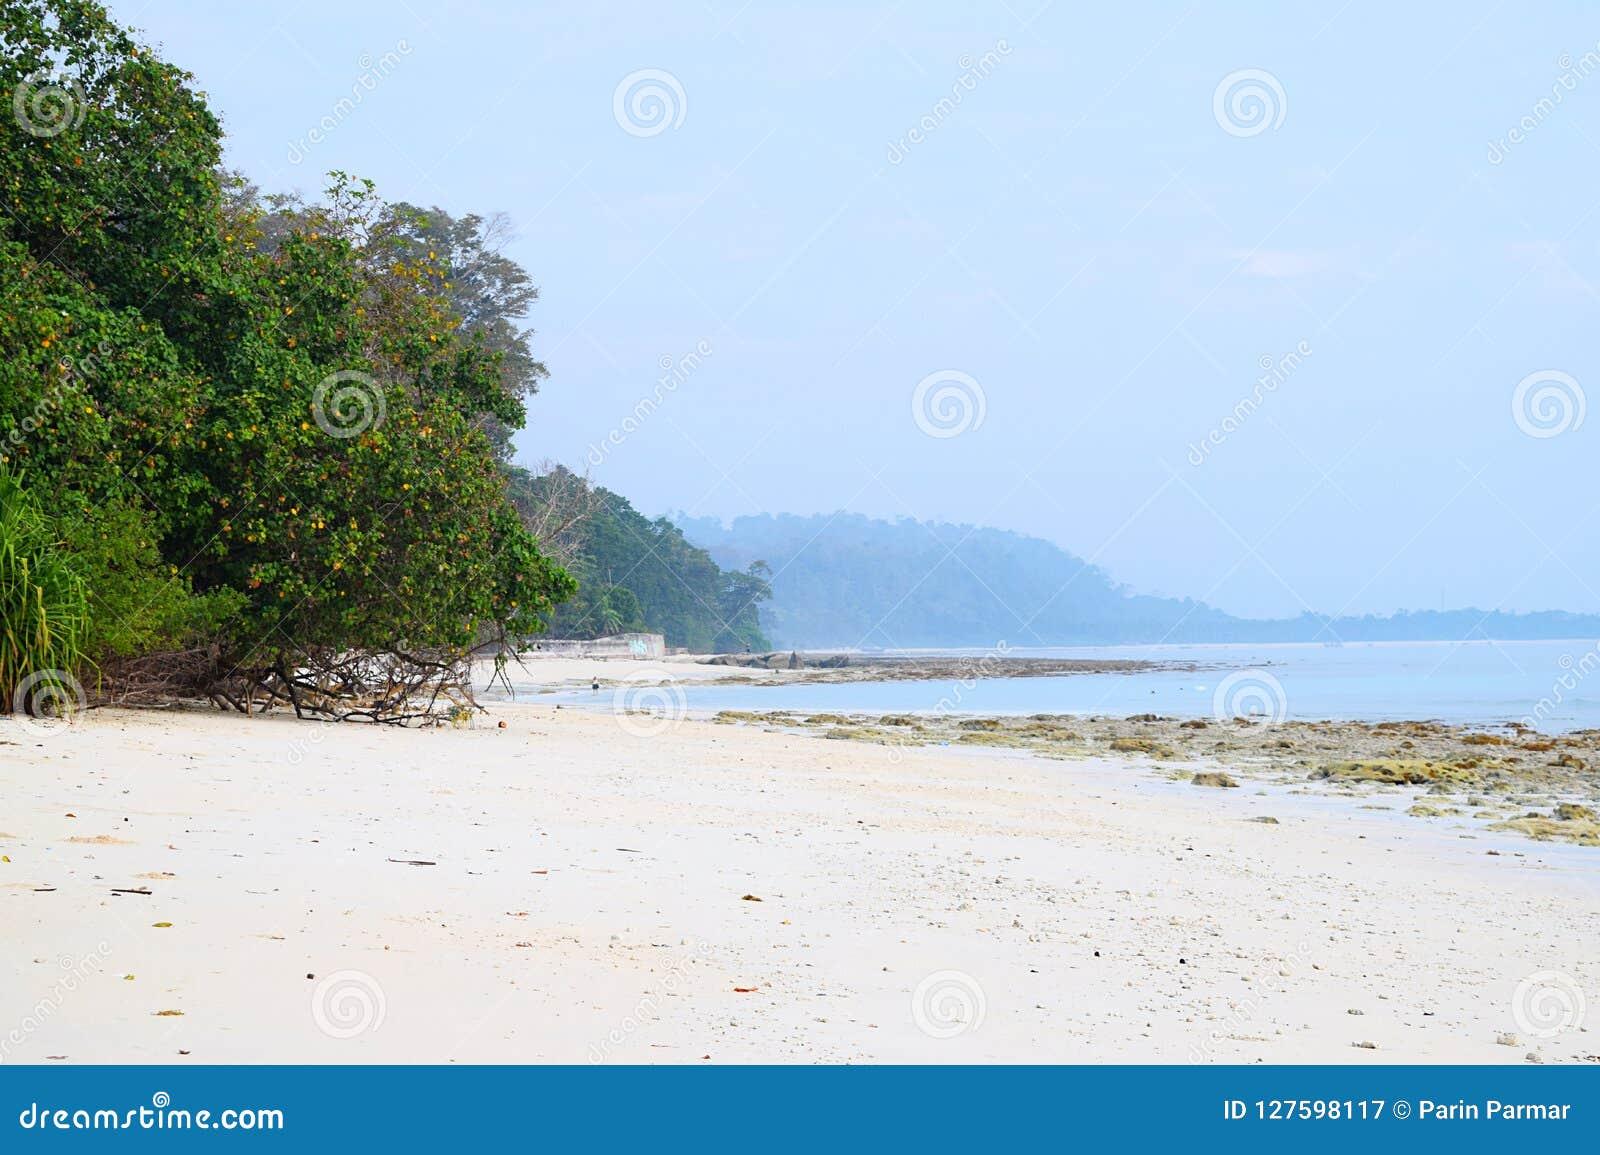 Oorspronkelijk en Rustig Wit Sandy Beach met Mangrovebomen met Azure Sea Water en Duidelijke Hemel - Kalapathar, Havelock, Andama